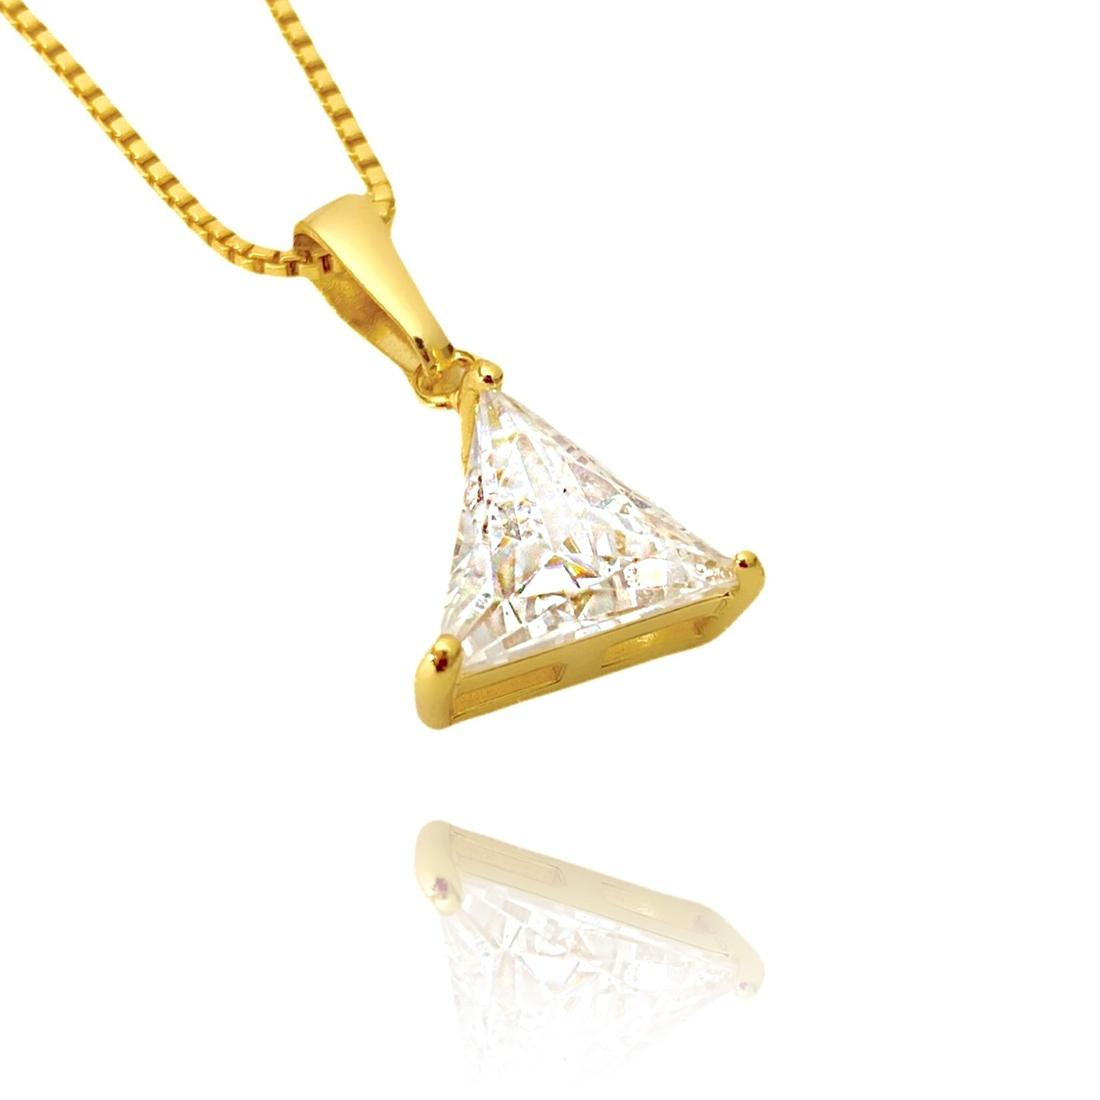 kit Colar Elo Portugues 2,8mm 45cm (8,1g) + Pingente Triângulo Pedra Zircônia